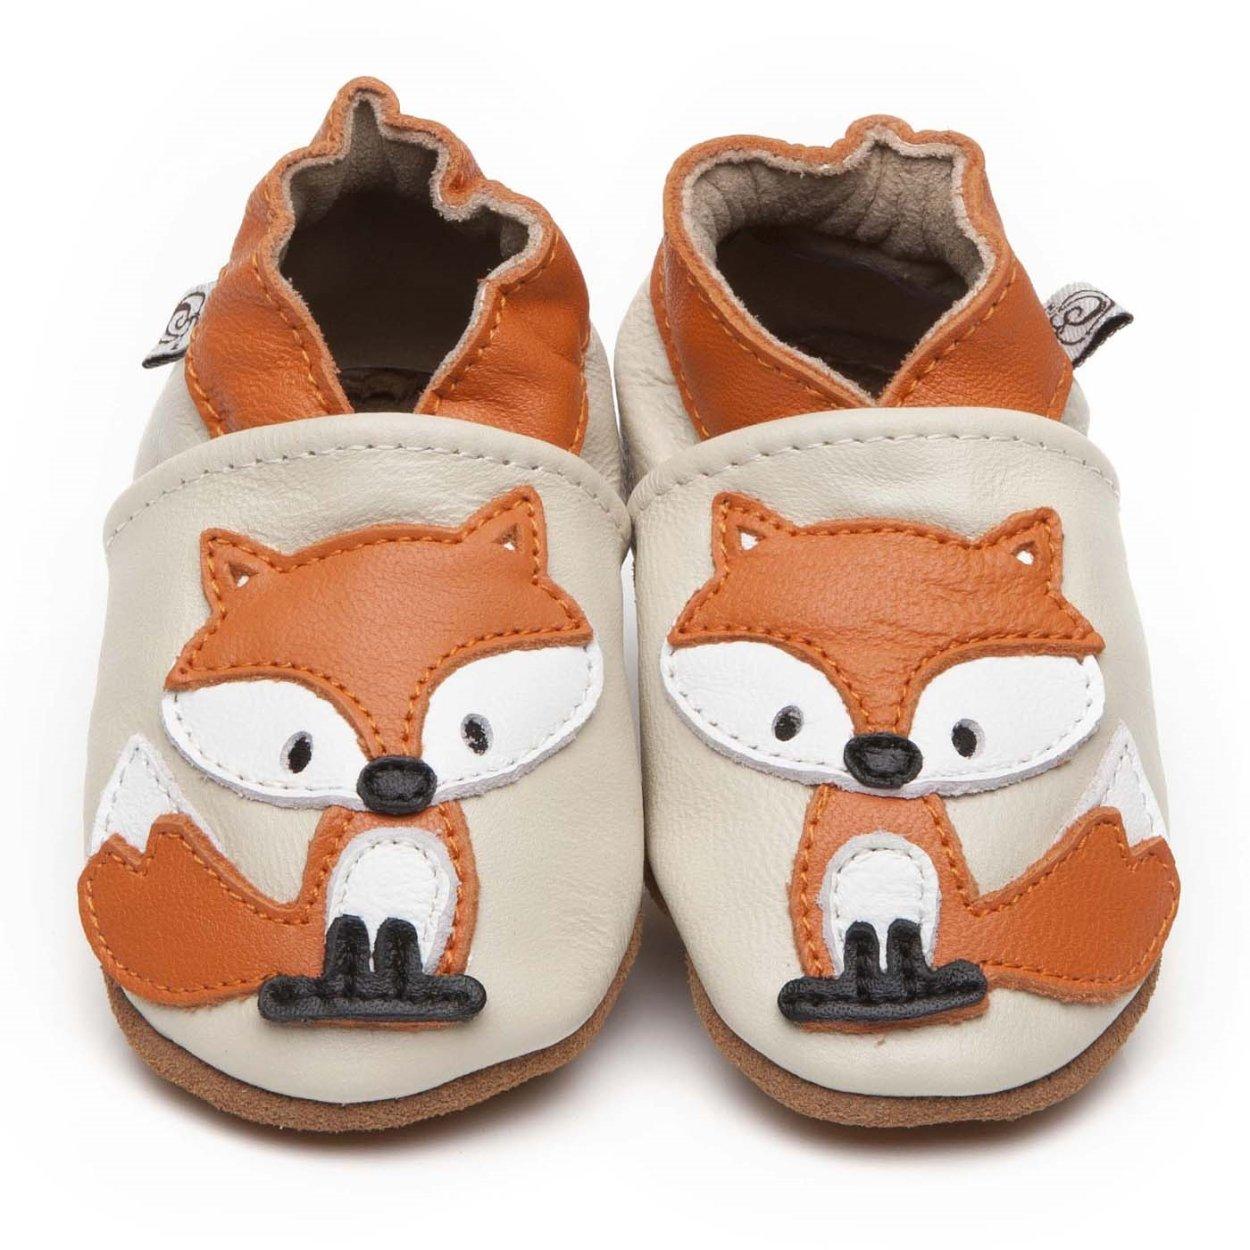 Weiche Leder Baby Schuhe Fuchses 6-12 monate Olea London